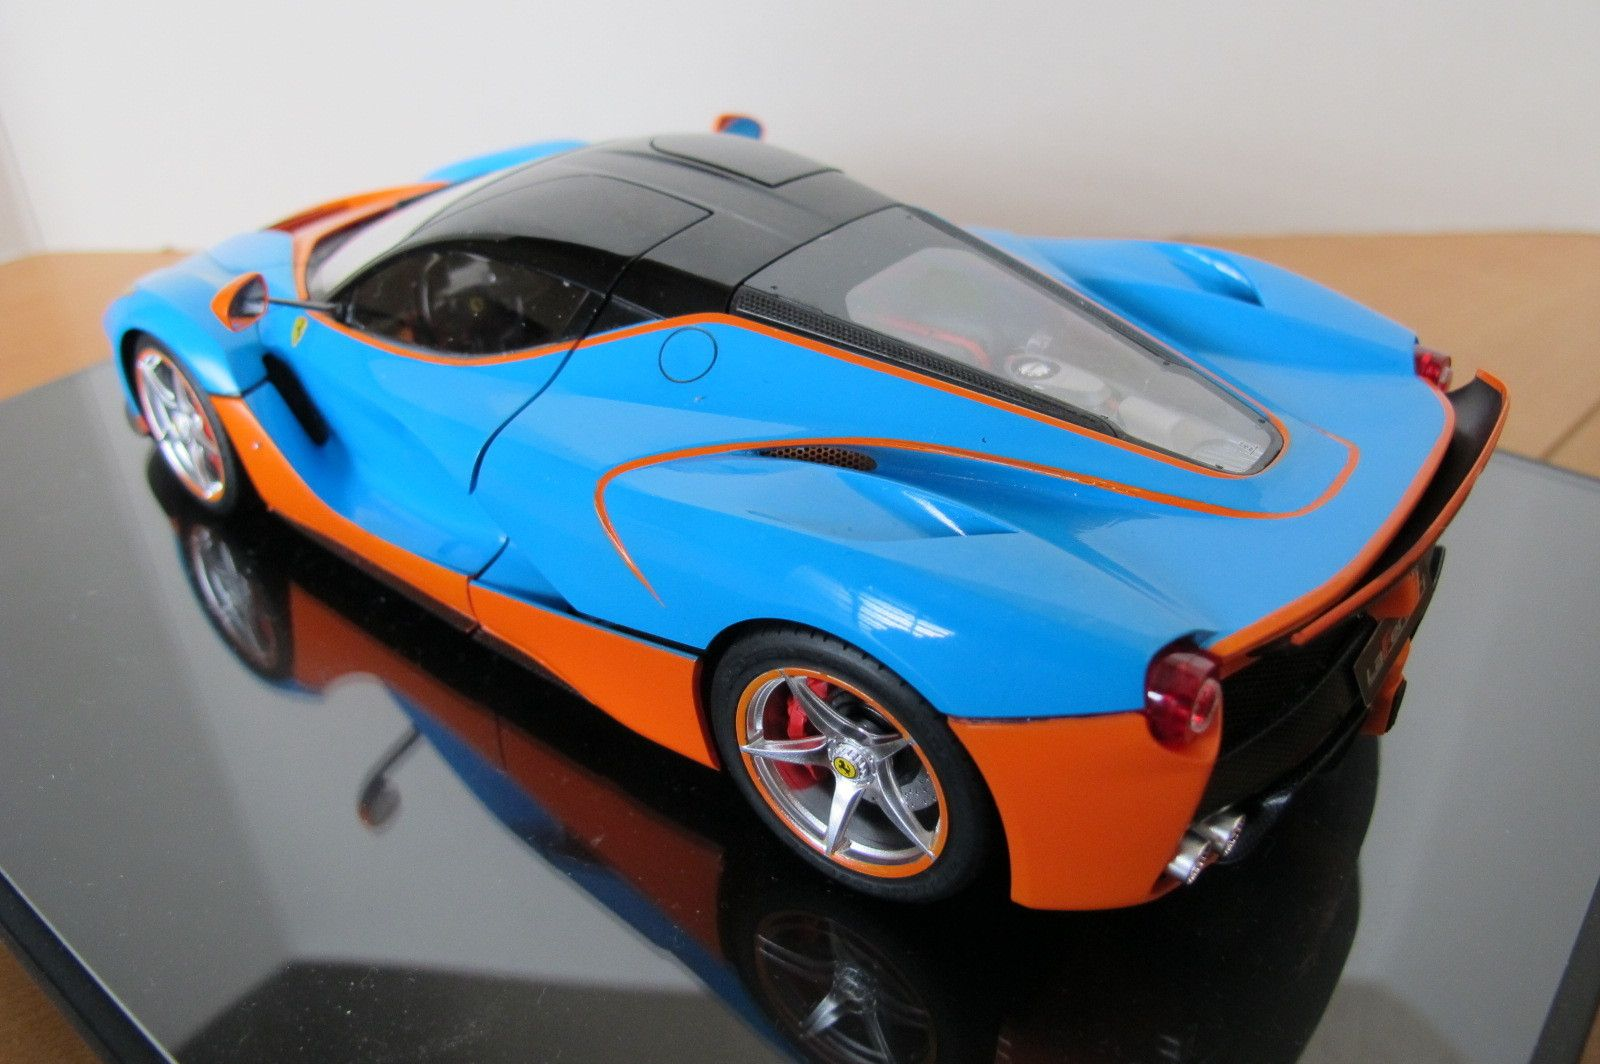 LaFerrari GulfLivery 1/24 Scale Model Scale models